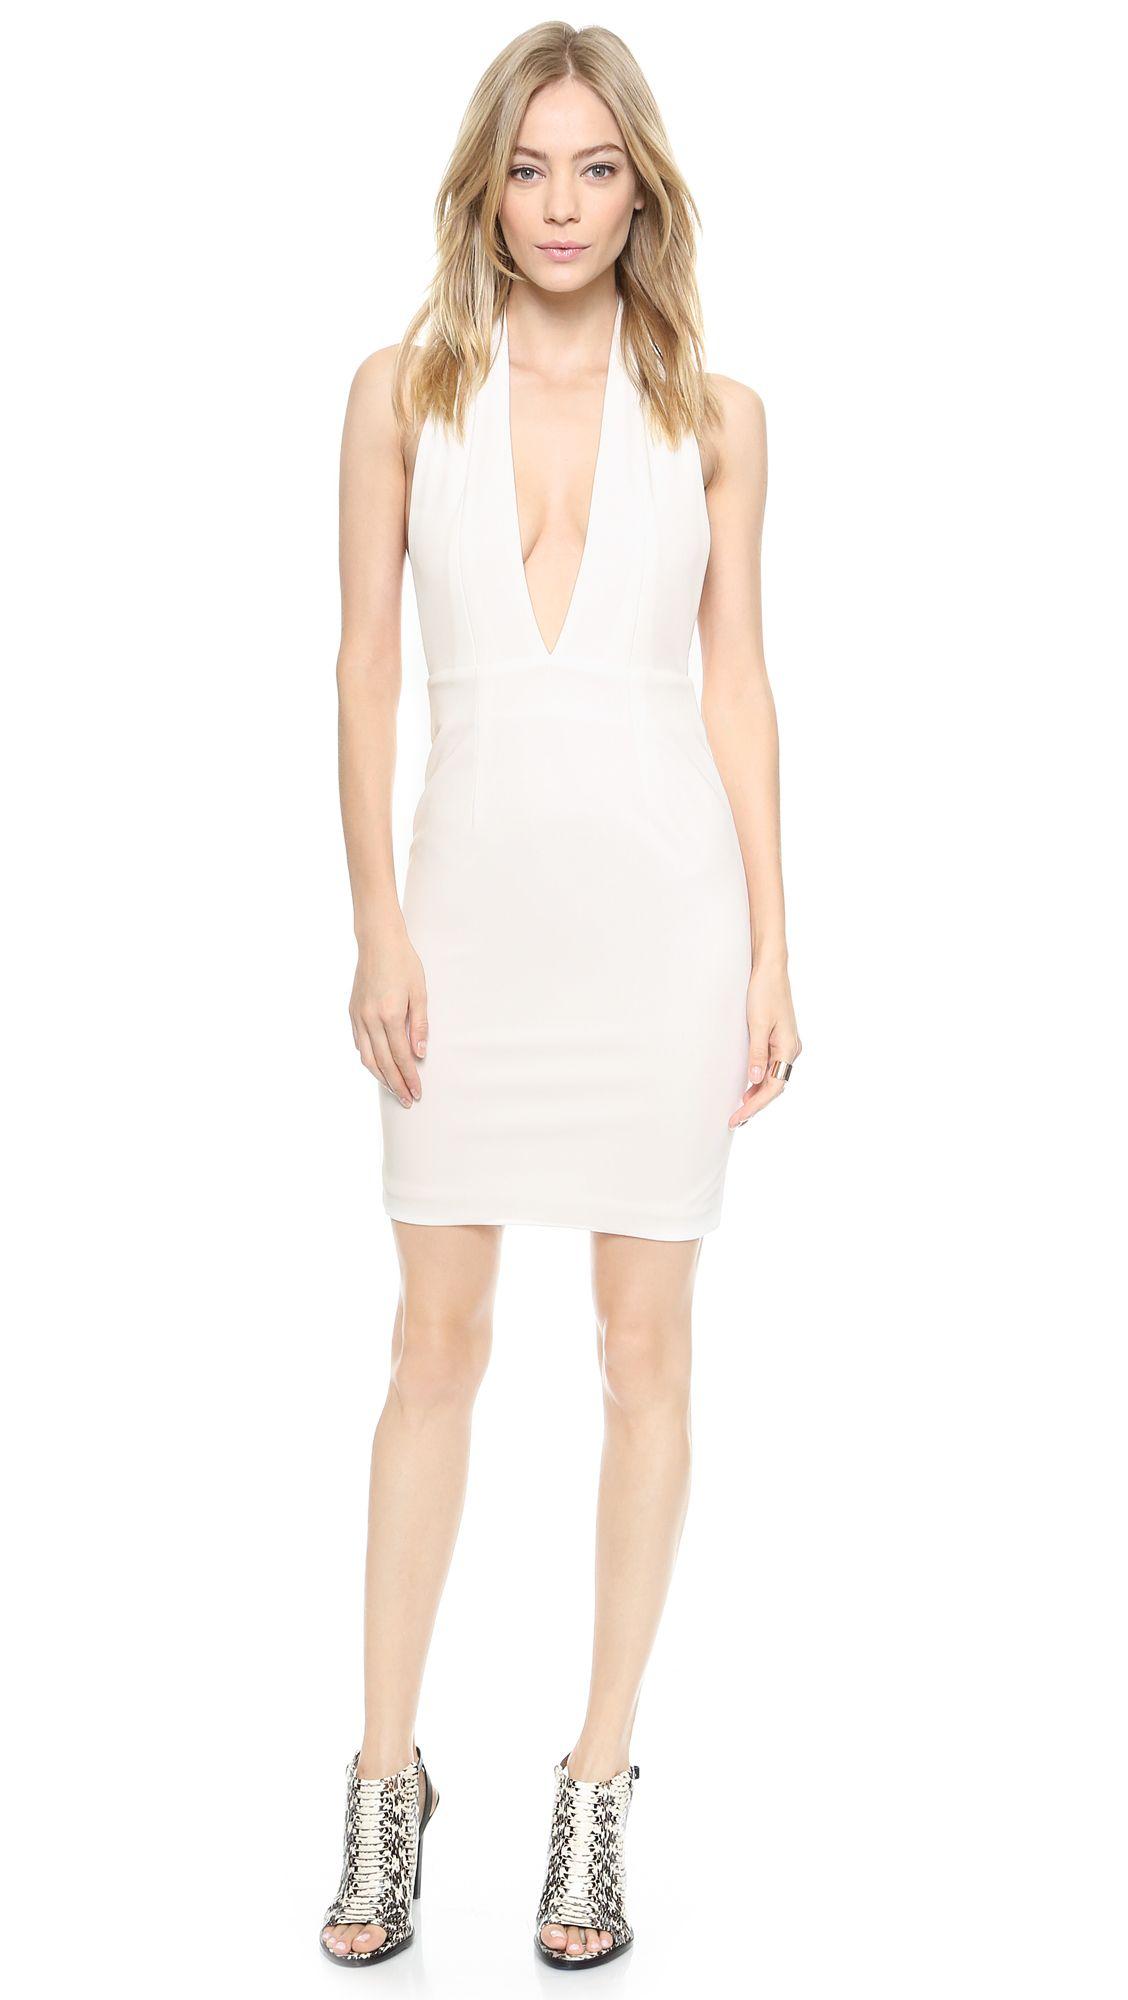 Solace London Elora Mini Dress